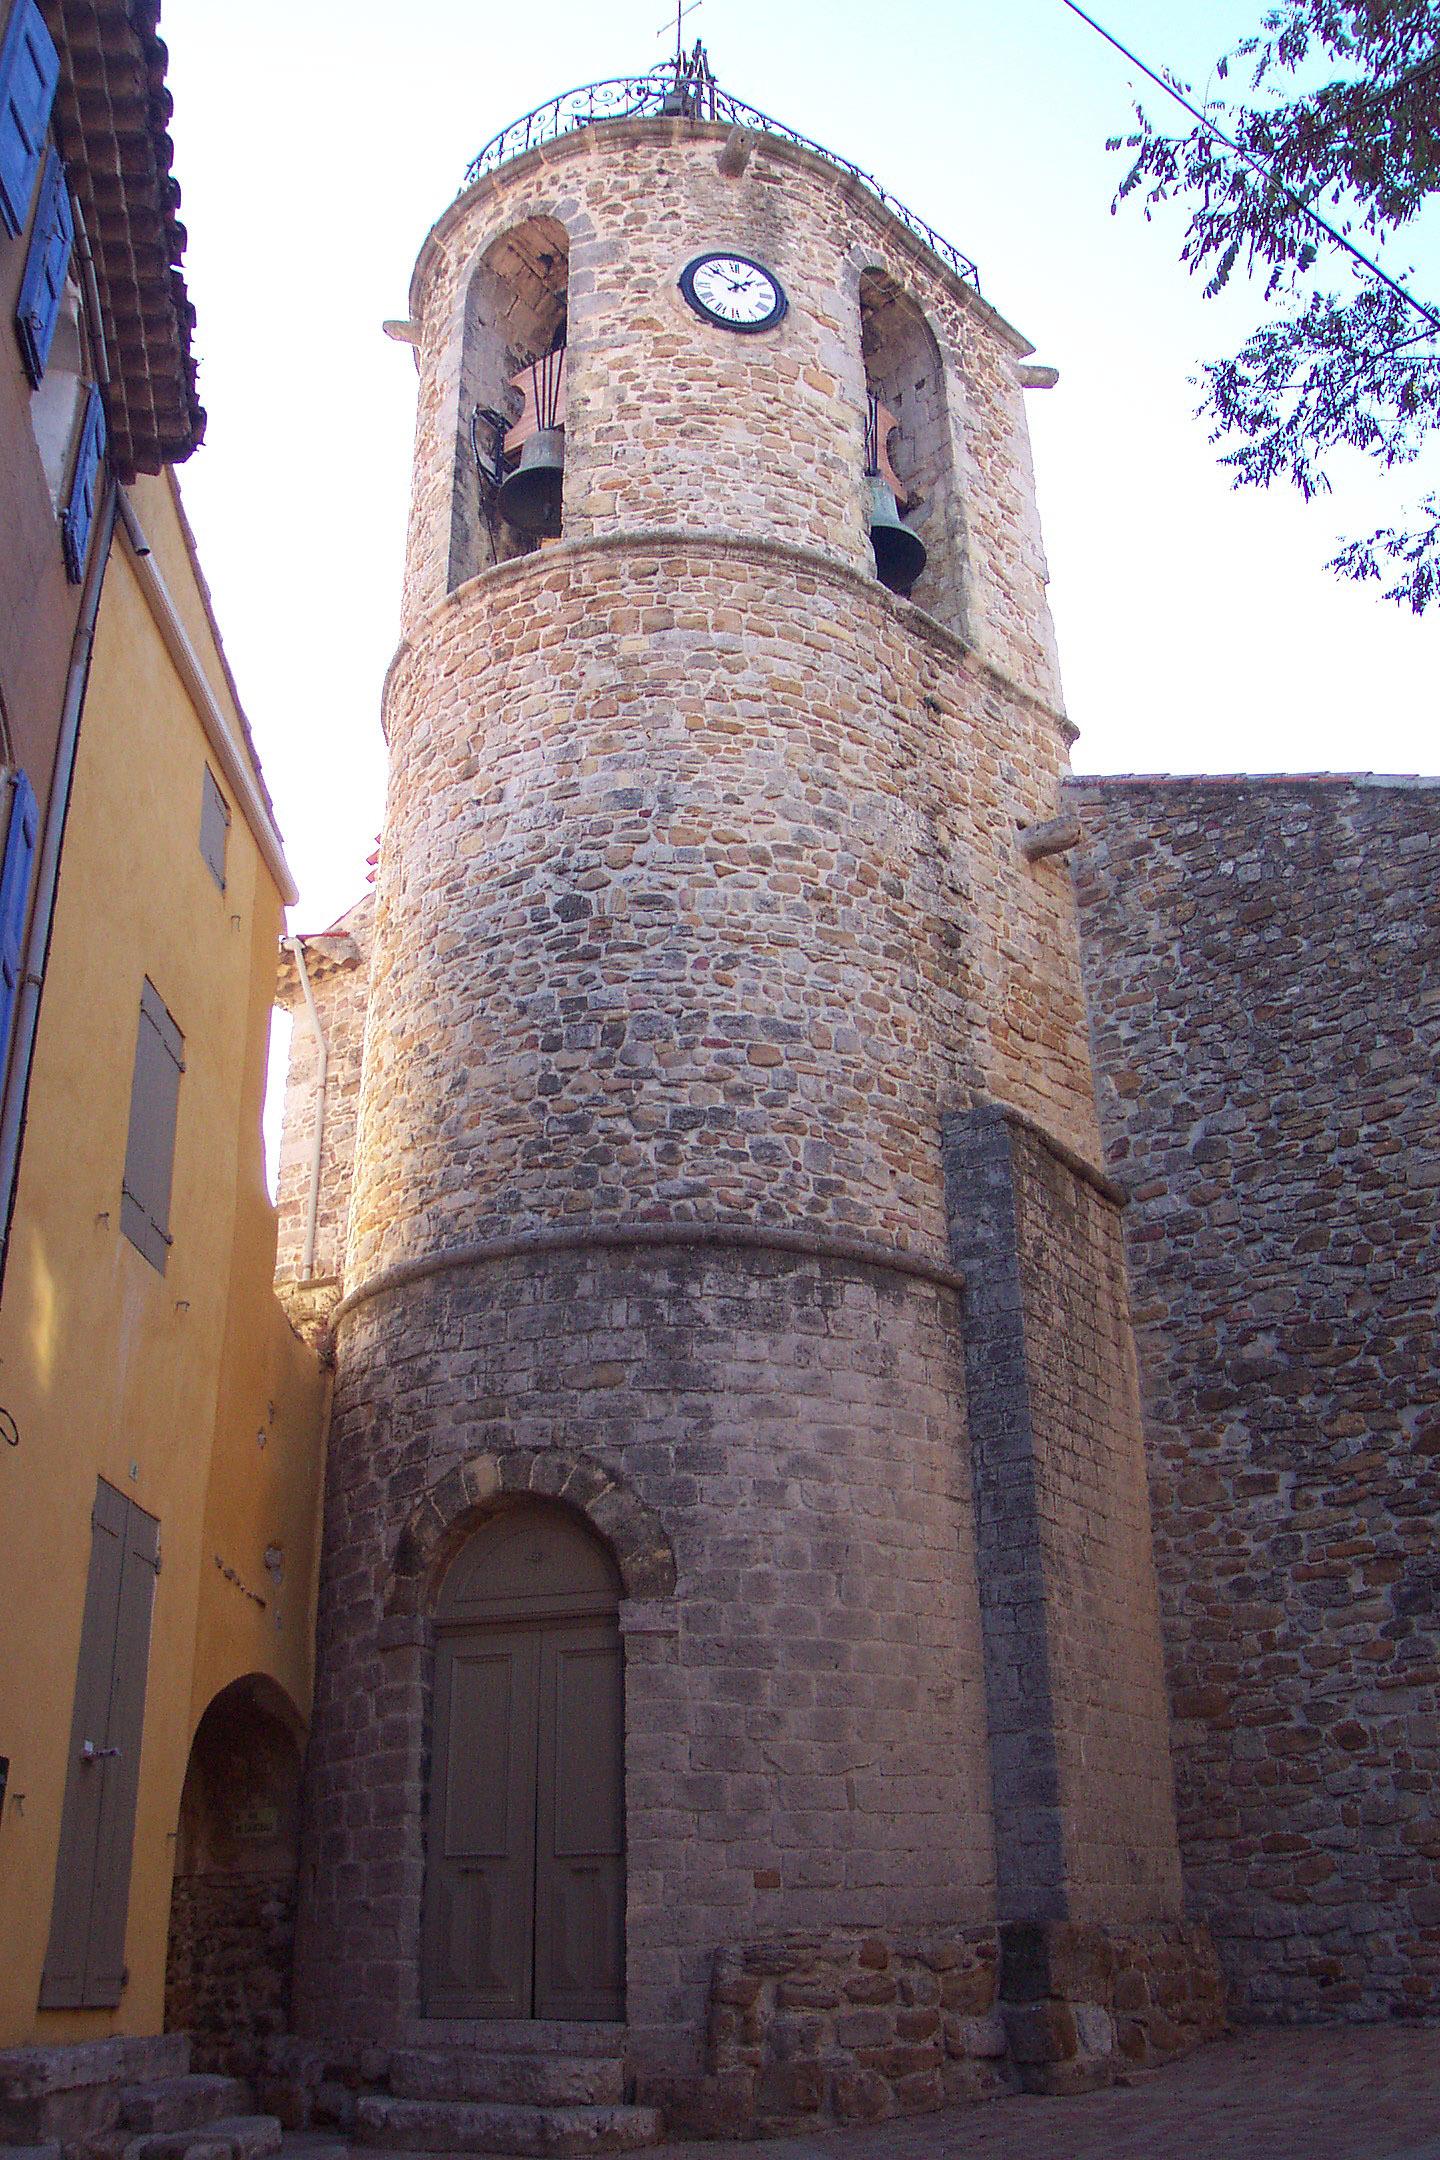 Le clocher de Peynier